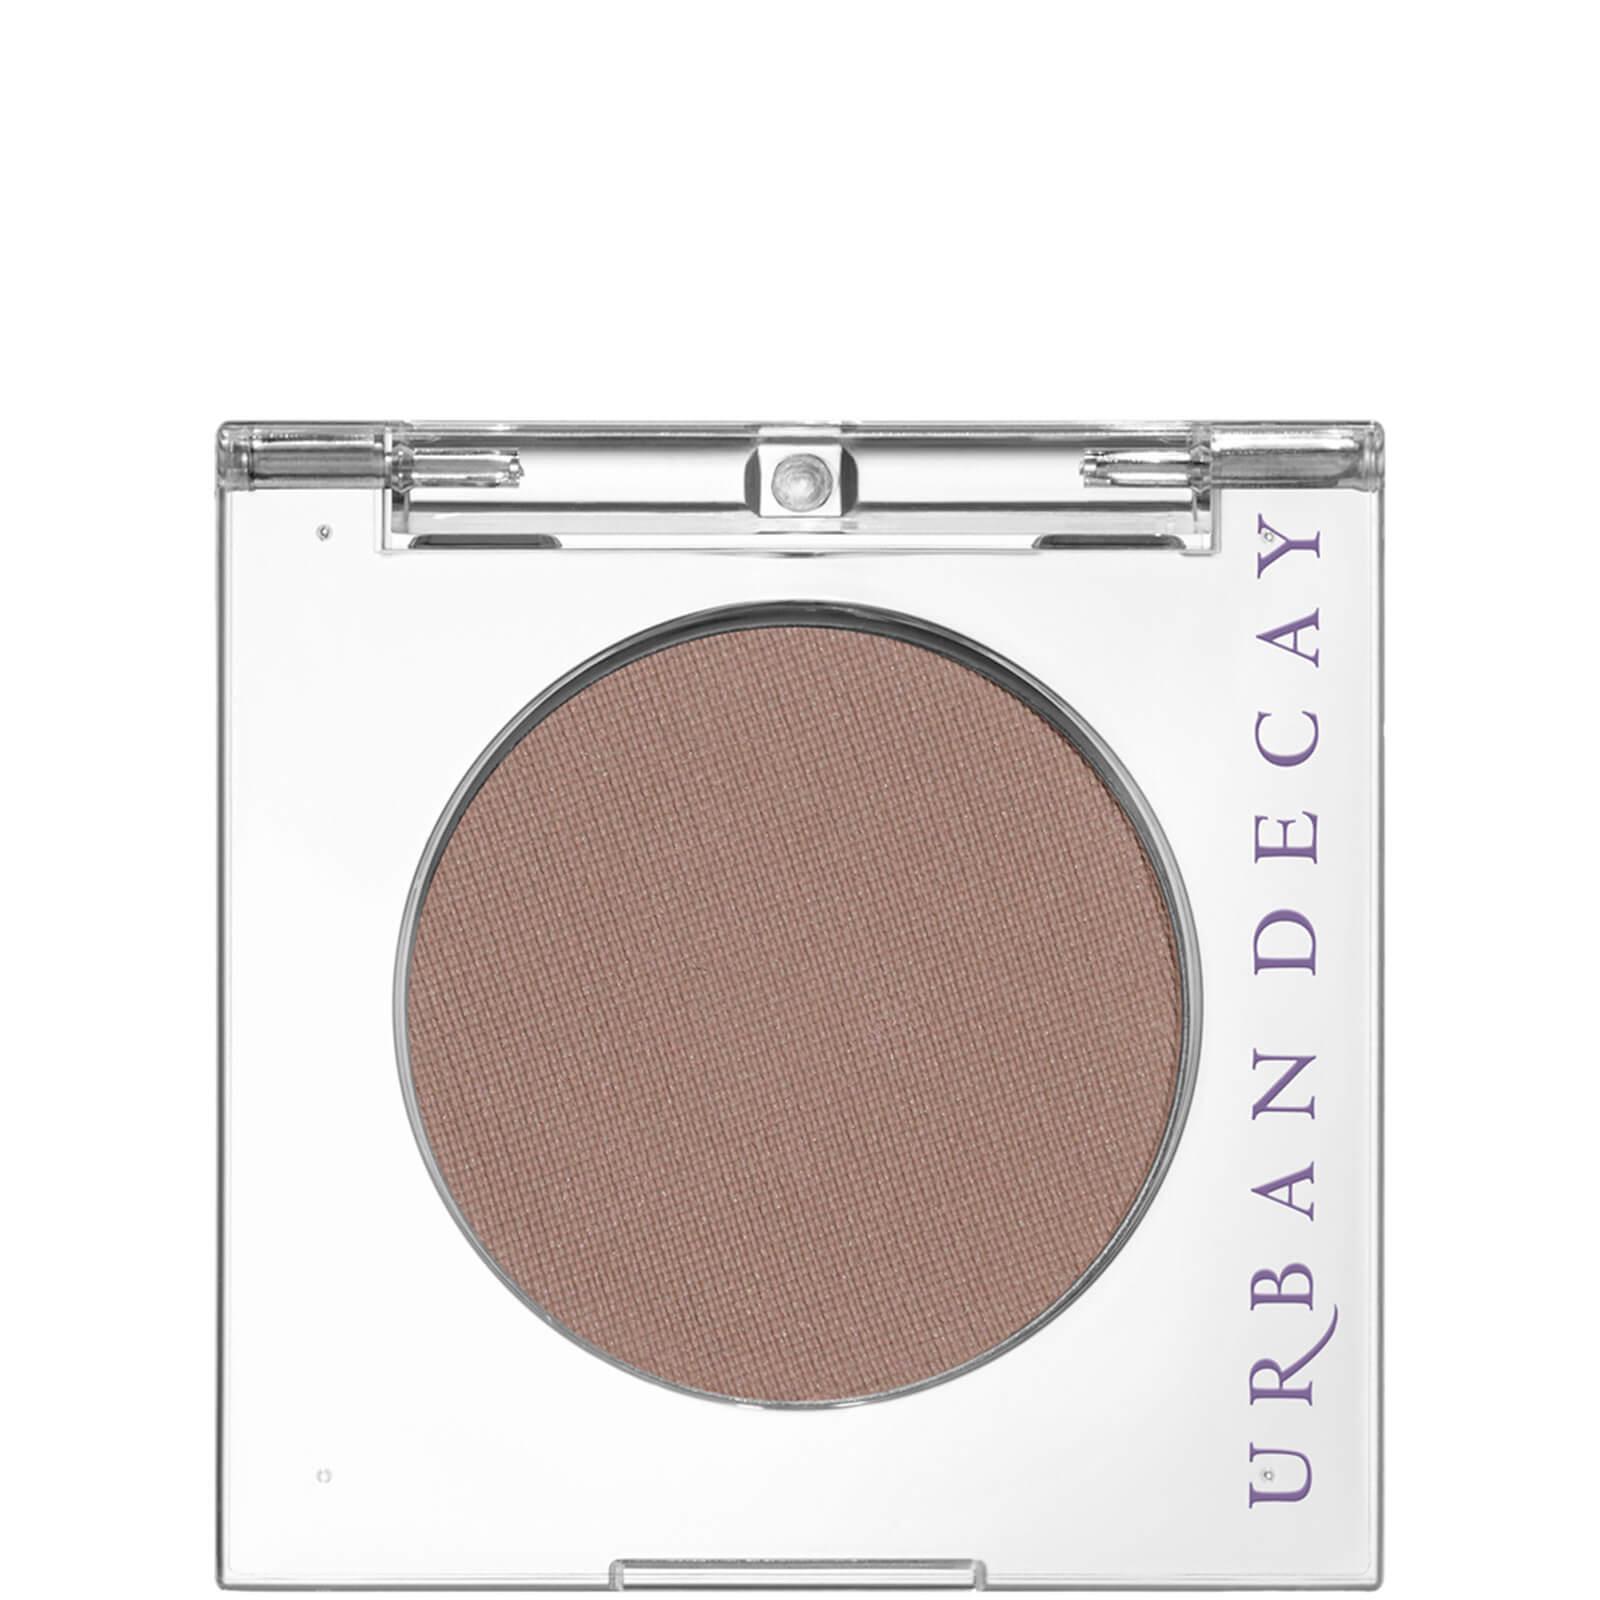 Купить Urban Decay 24/7 Eyeshadow Mono Moondust (Various Shades) - Tease